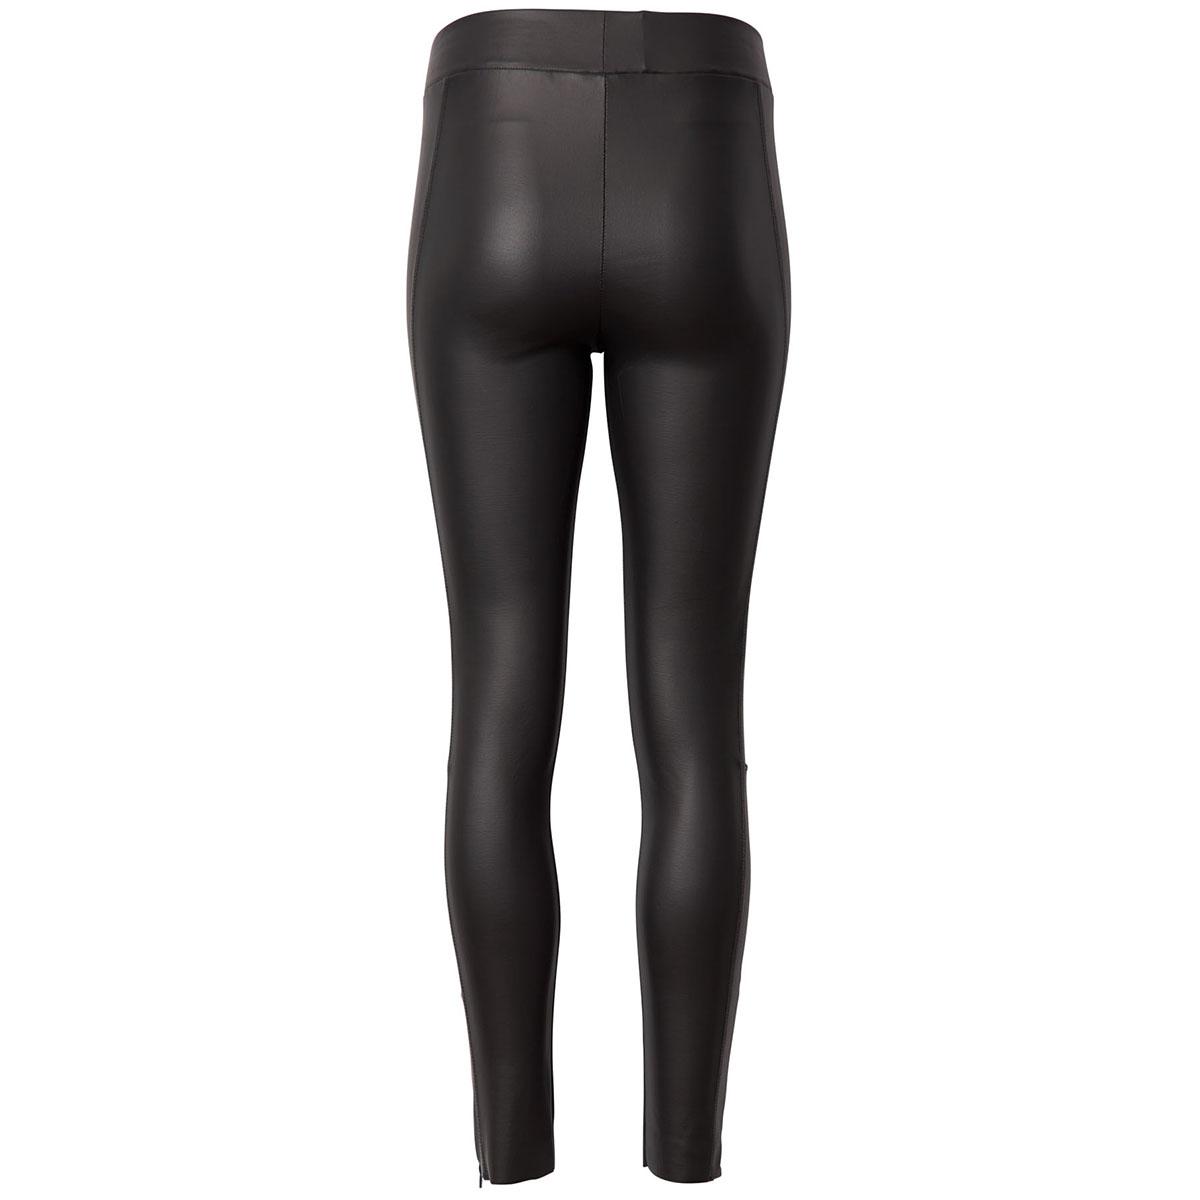 leatherlook leggings 20 022 0201 10 days legging black